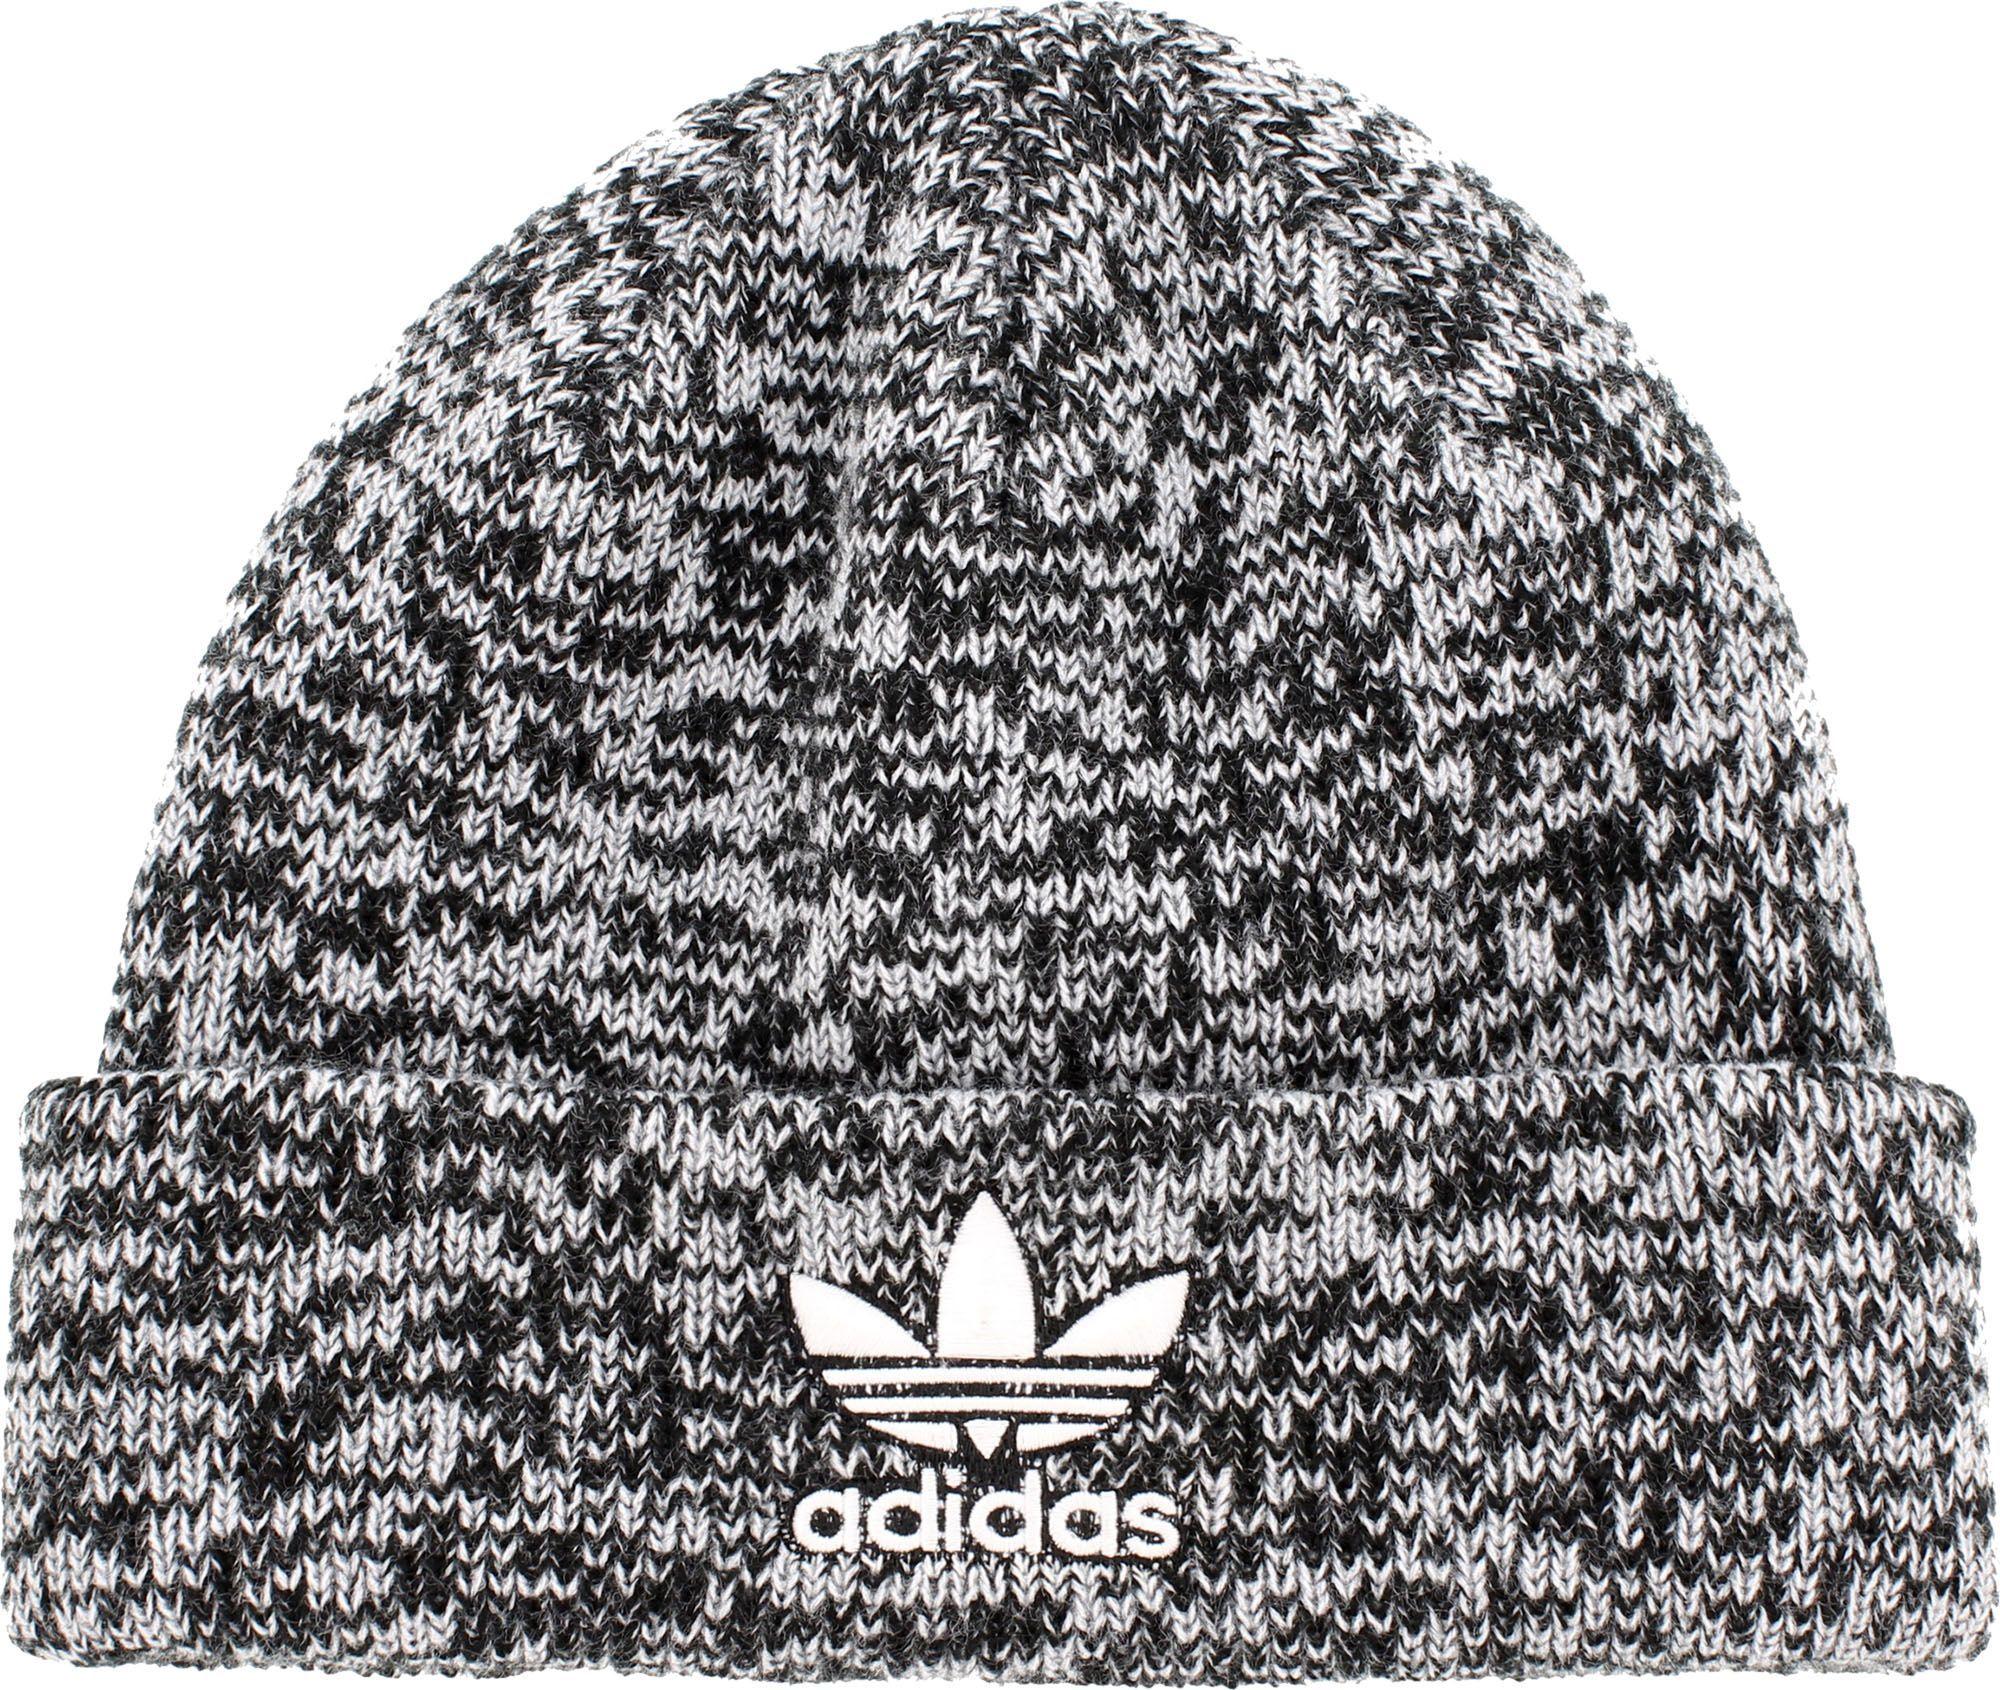 lowest price 55f83 759e7 adidas Originals Men s Trefoil II Knit Beanie, Black